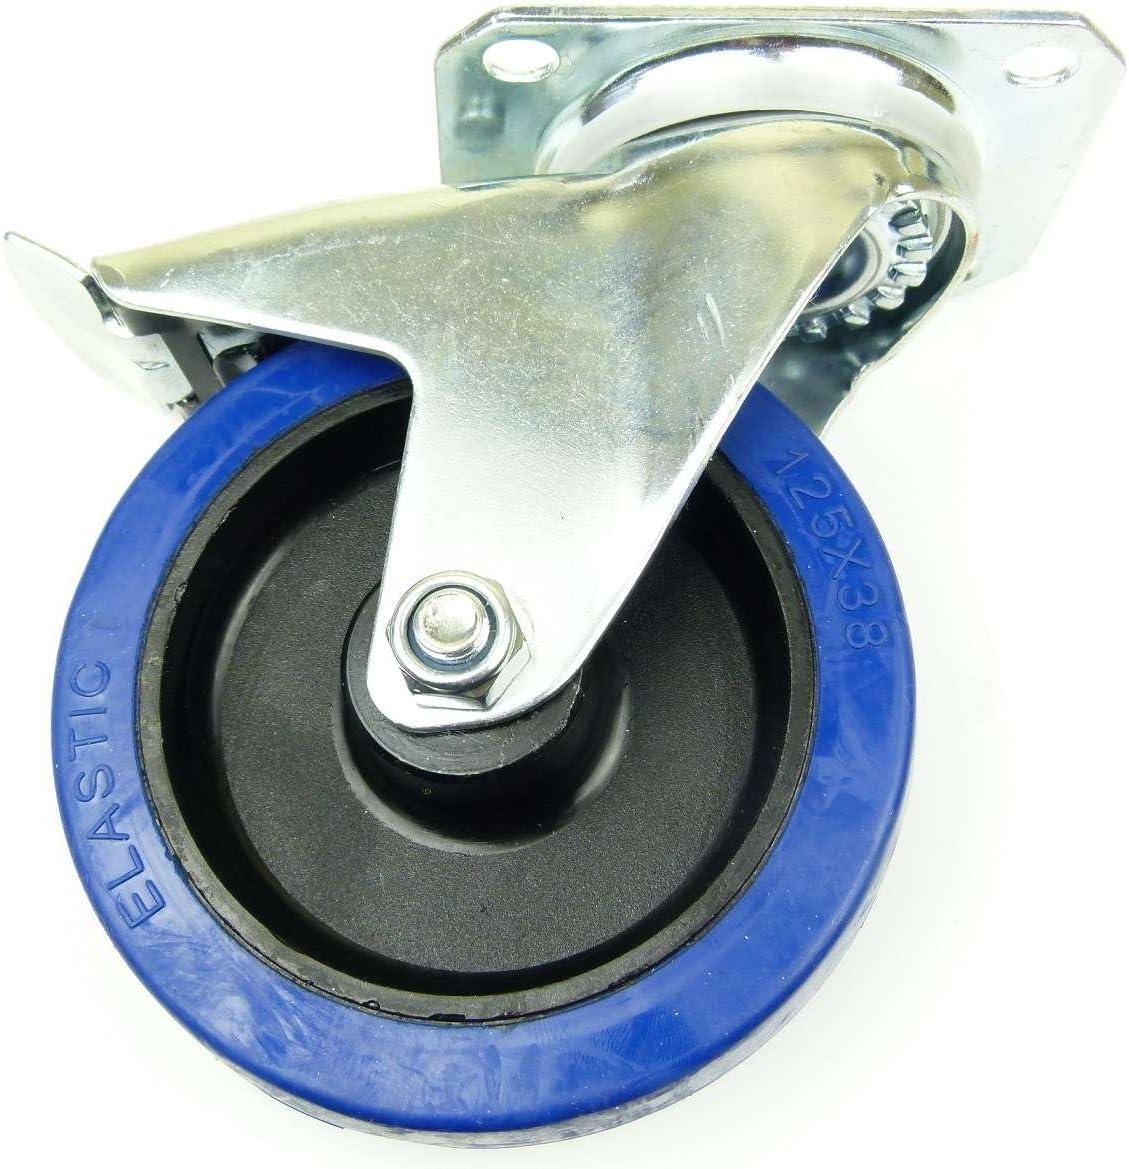 2x Brems + 2x Bock INDUSTRIEQALIT/ÄT 1 Satz 100mm Blue Wheels Transportrollen Lenkrollen mit Bremse//Feststellbremse 180kg // Rad Bockrollen Elastik-Rad blau